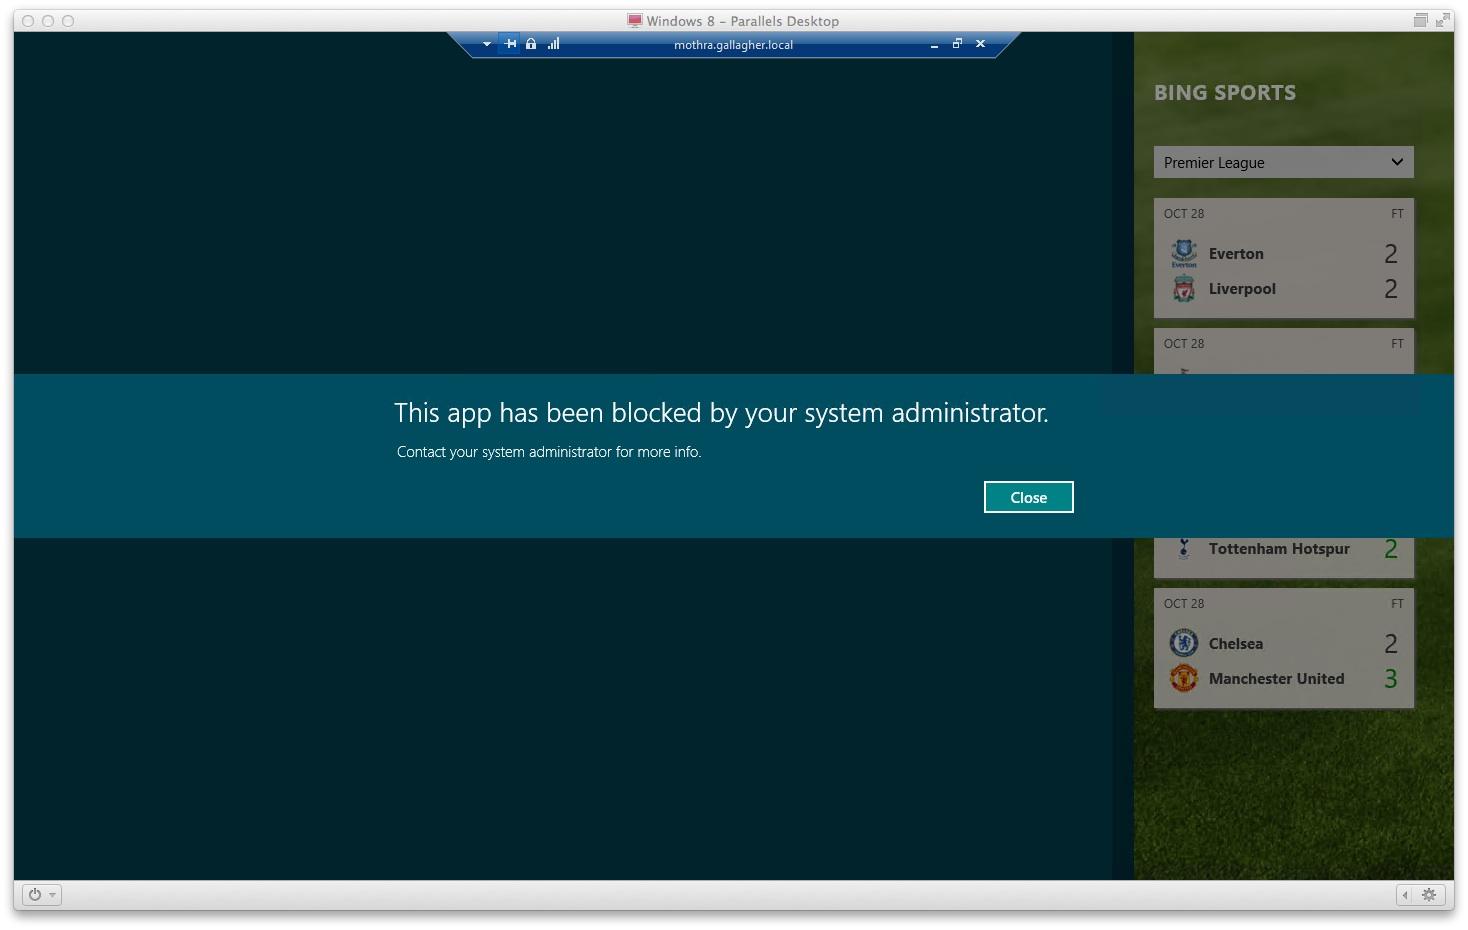 Windows 8 Enterprise informs the user that AppLocker has app blocked them.